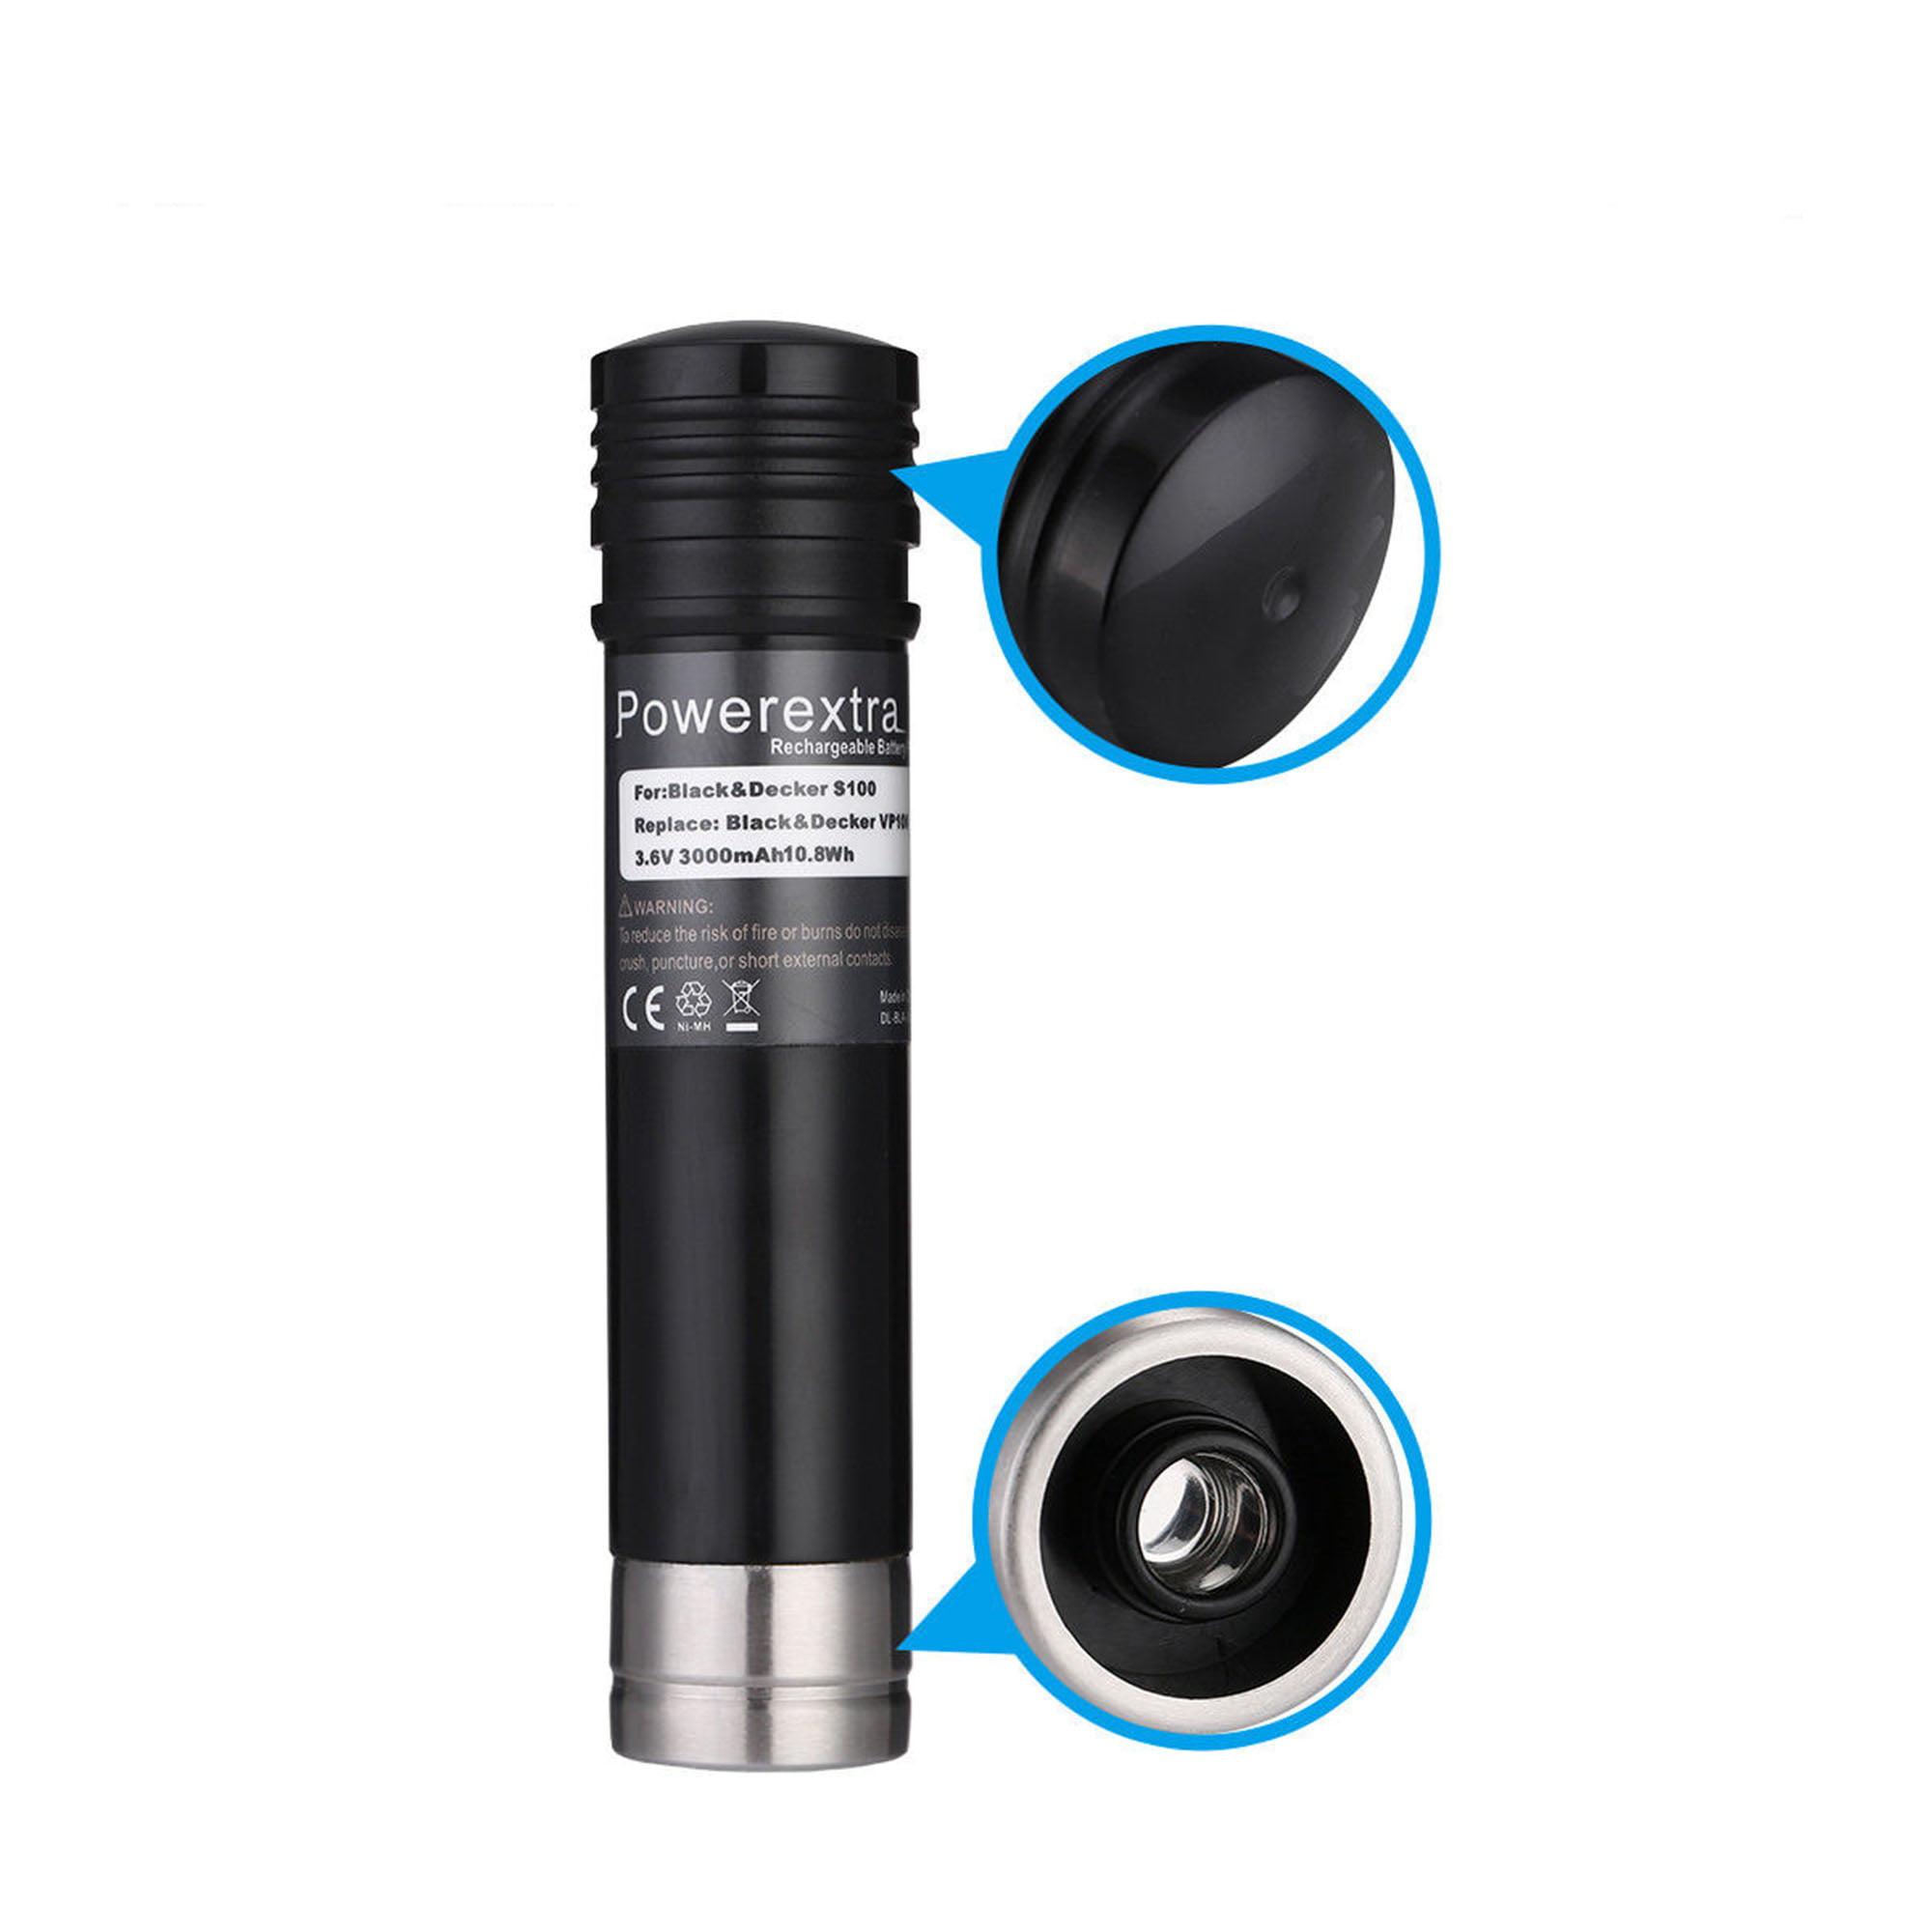 Powerextra 2-Pack 3000mAh 3 6V Replacement Battery for Black&Decker  Versapak Vp100, Vp105, Vp110, Vp142, Vp7240 Sears-Craftsman Pivot180,  PLR36NC,